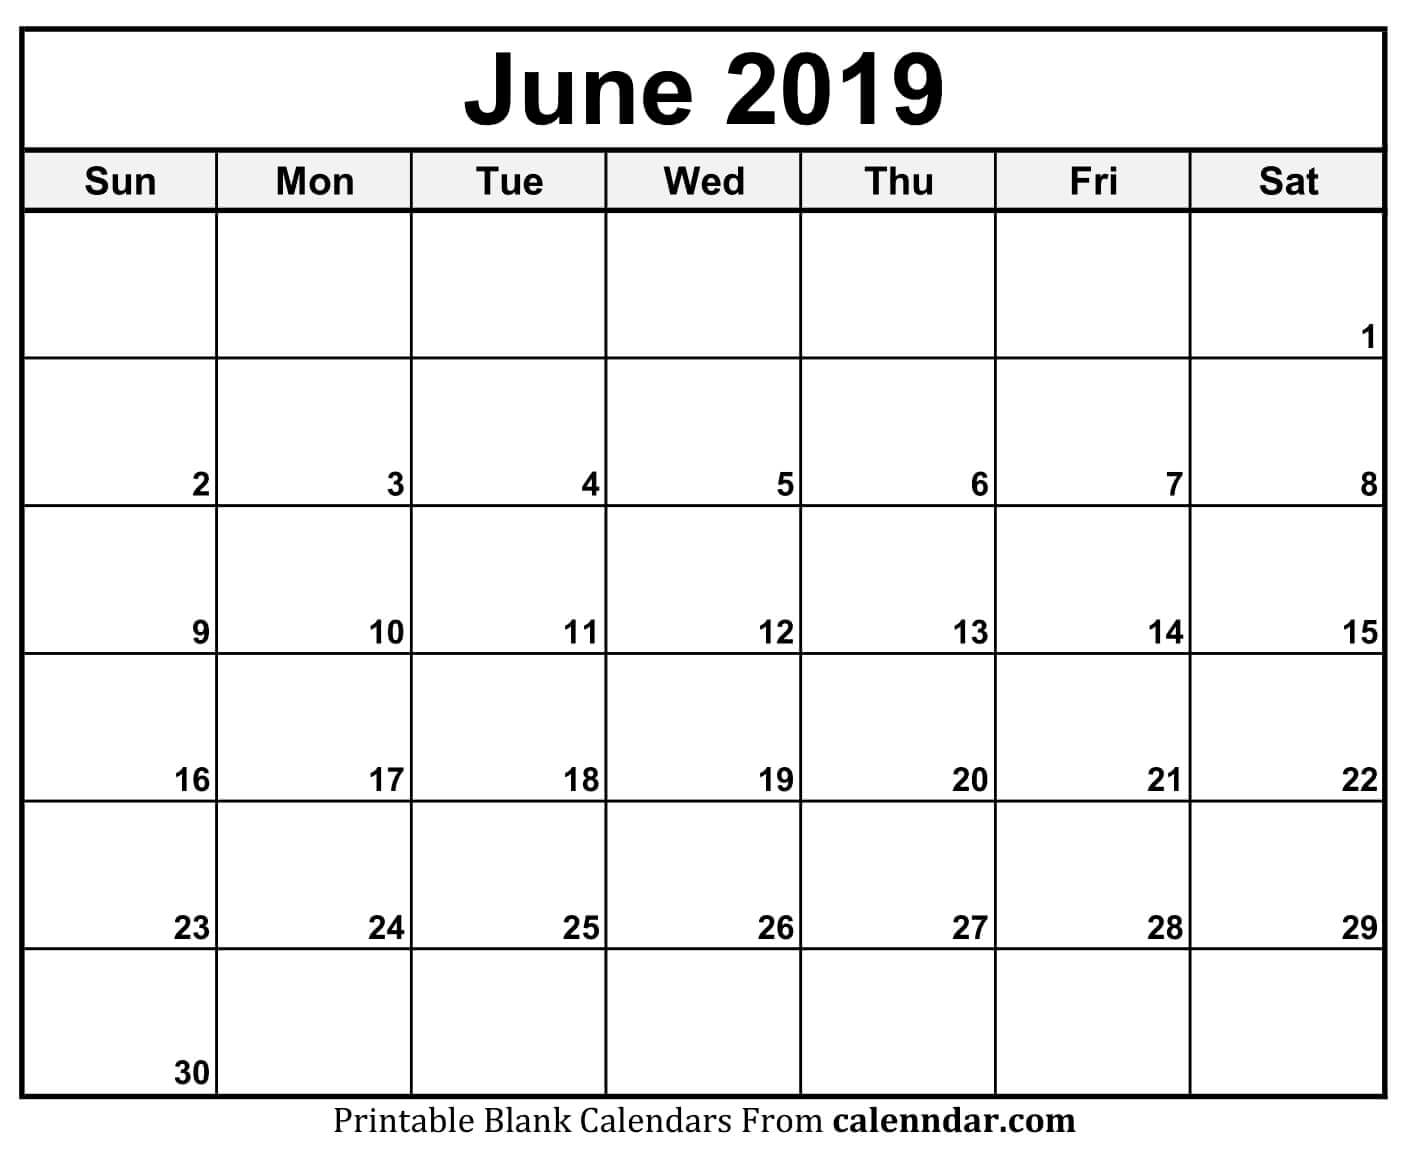 Free Printable Calendar Of June 2019 Blank Templates Word